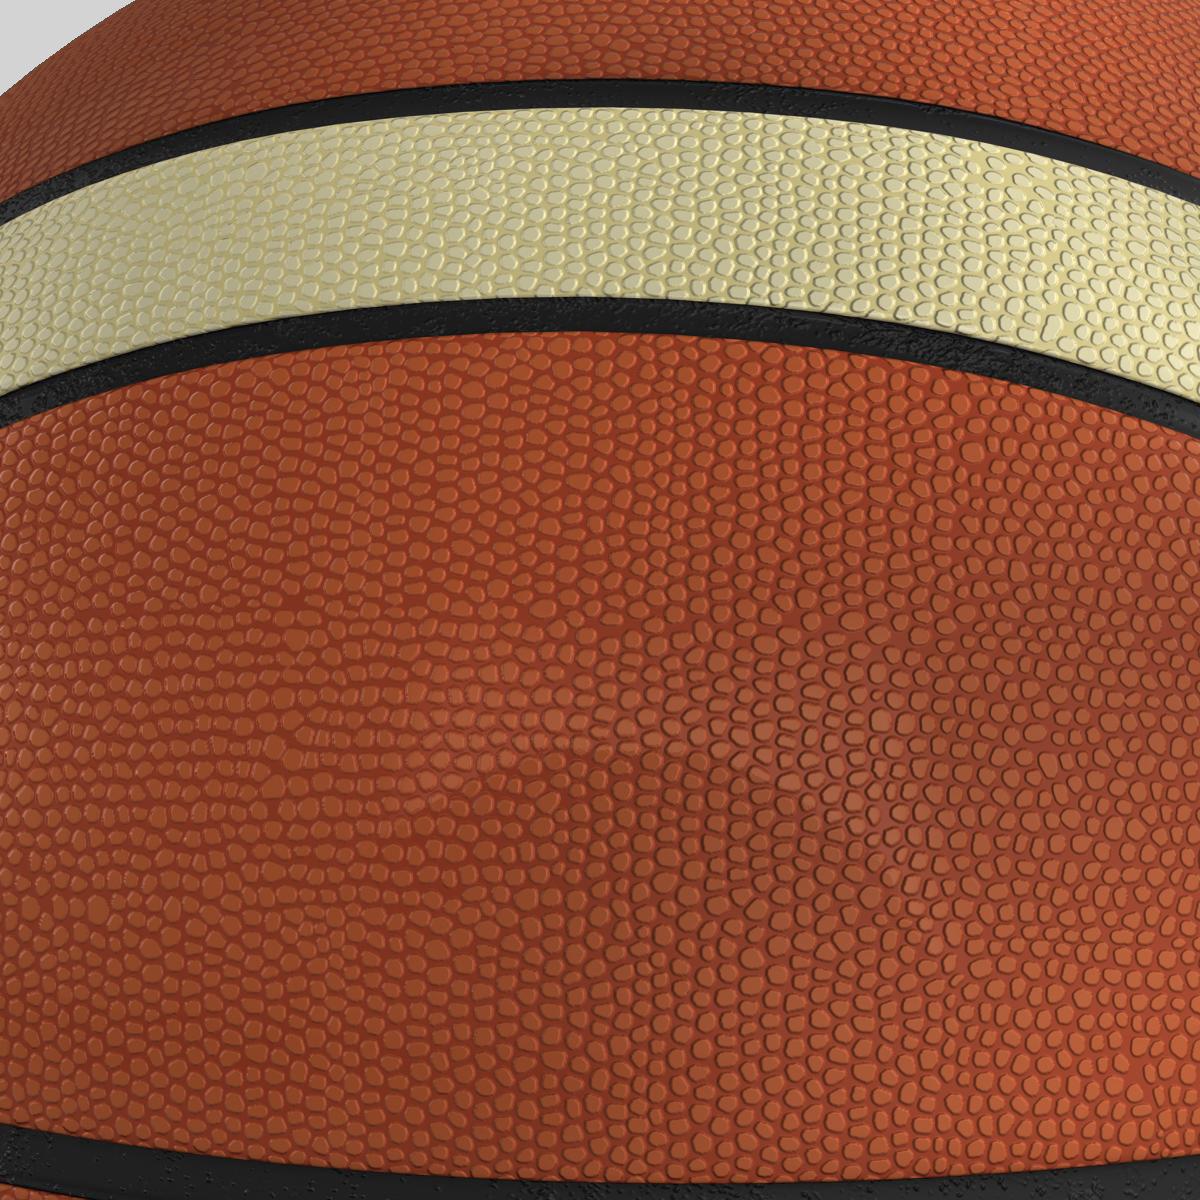 basketball ball eba 3d model 3ds max fbx c4d ma mb obj 165282